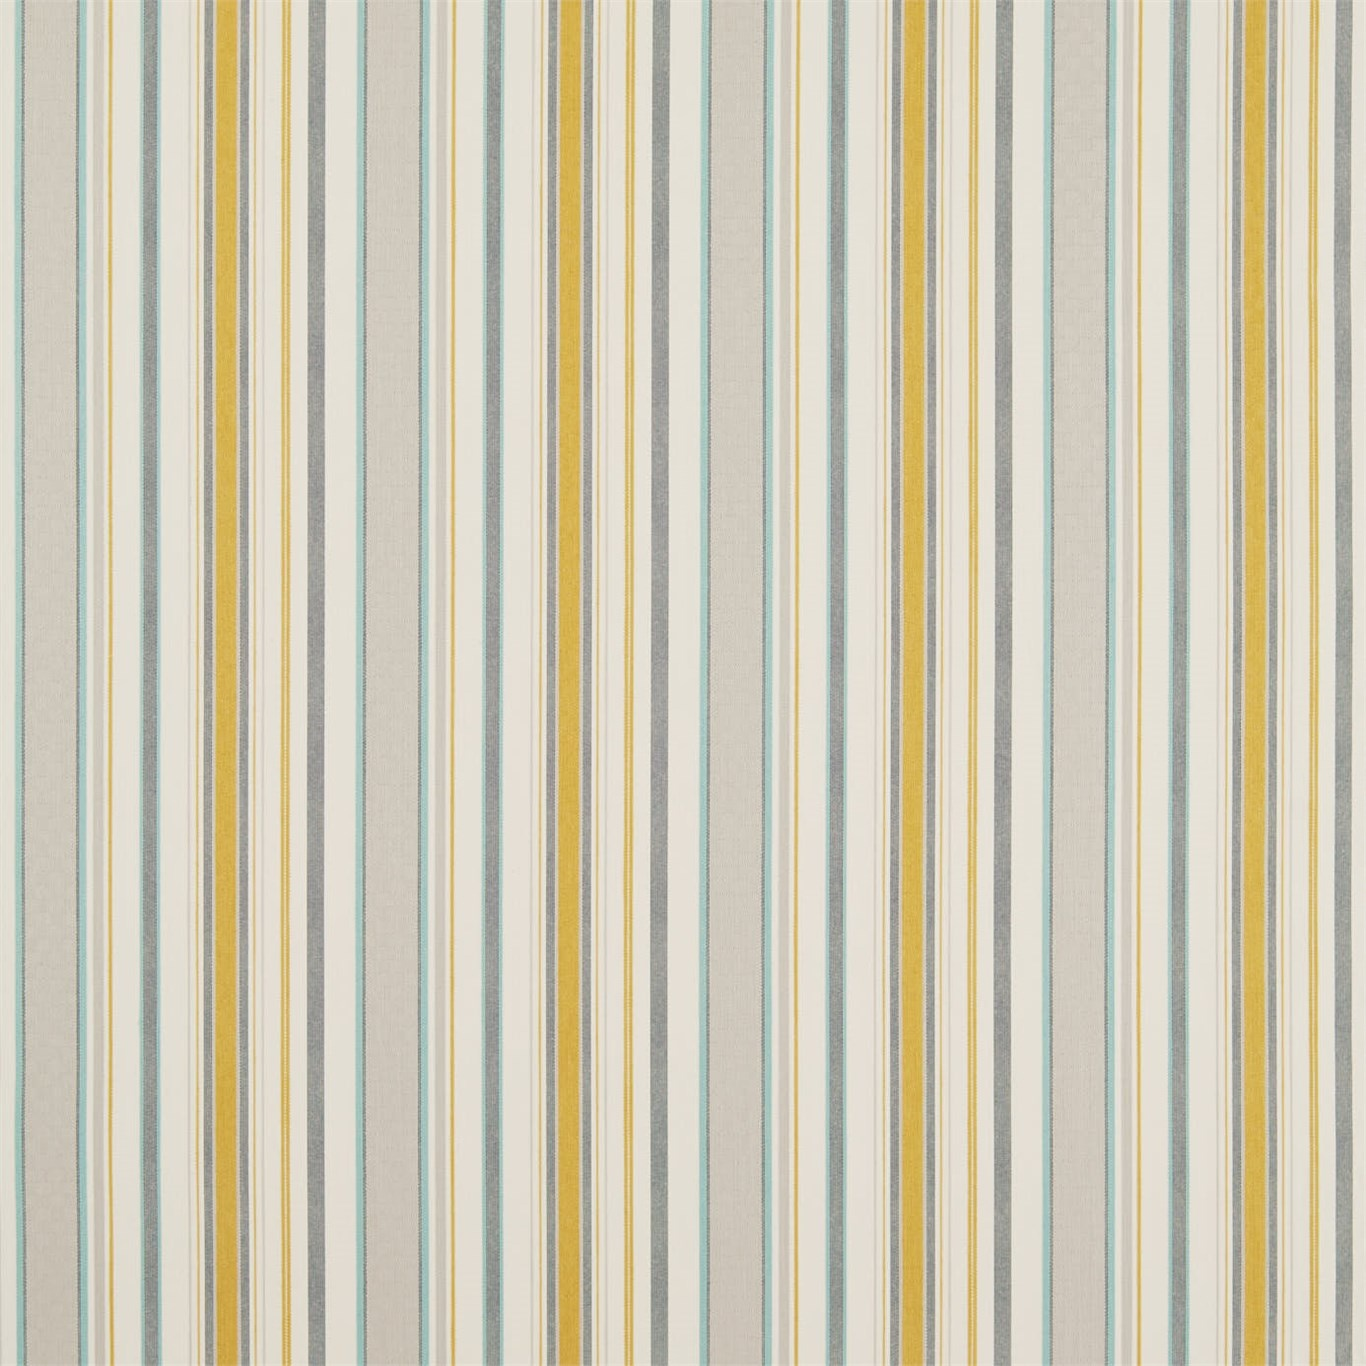 Image of Sanderson Home Dobby Stripe Dijon Curtain Fabric 235895